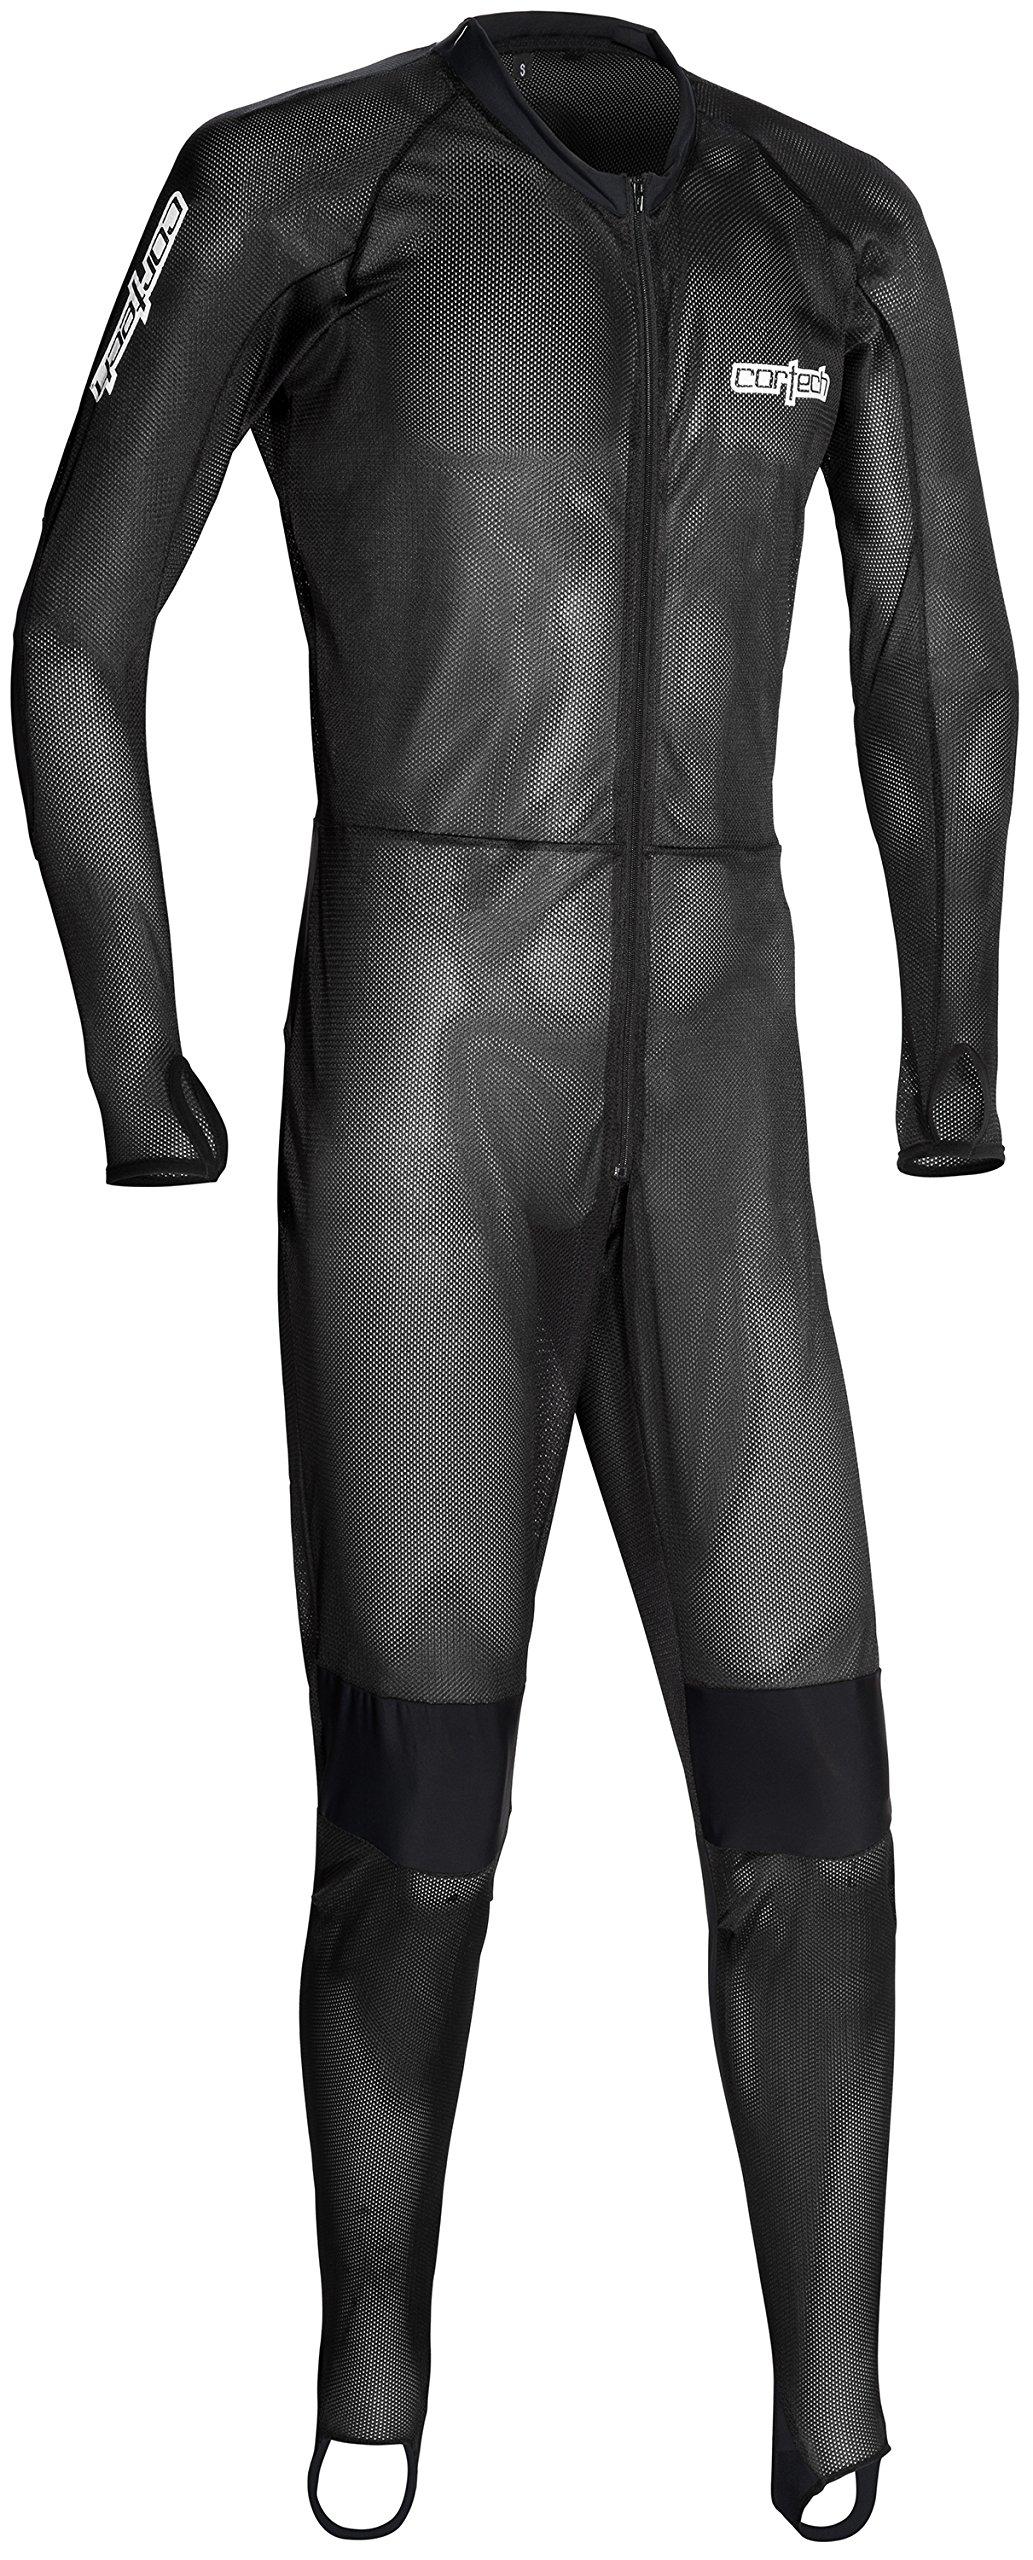 Cortech XF-10-8975-0105-03 Quick Dry Air Undersuit, Distinct Name: Black, Gender: Mens/Unisex, Primary Color: Black, Size: XS